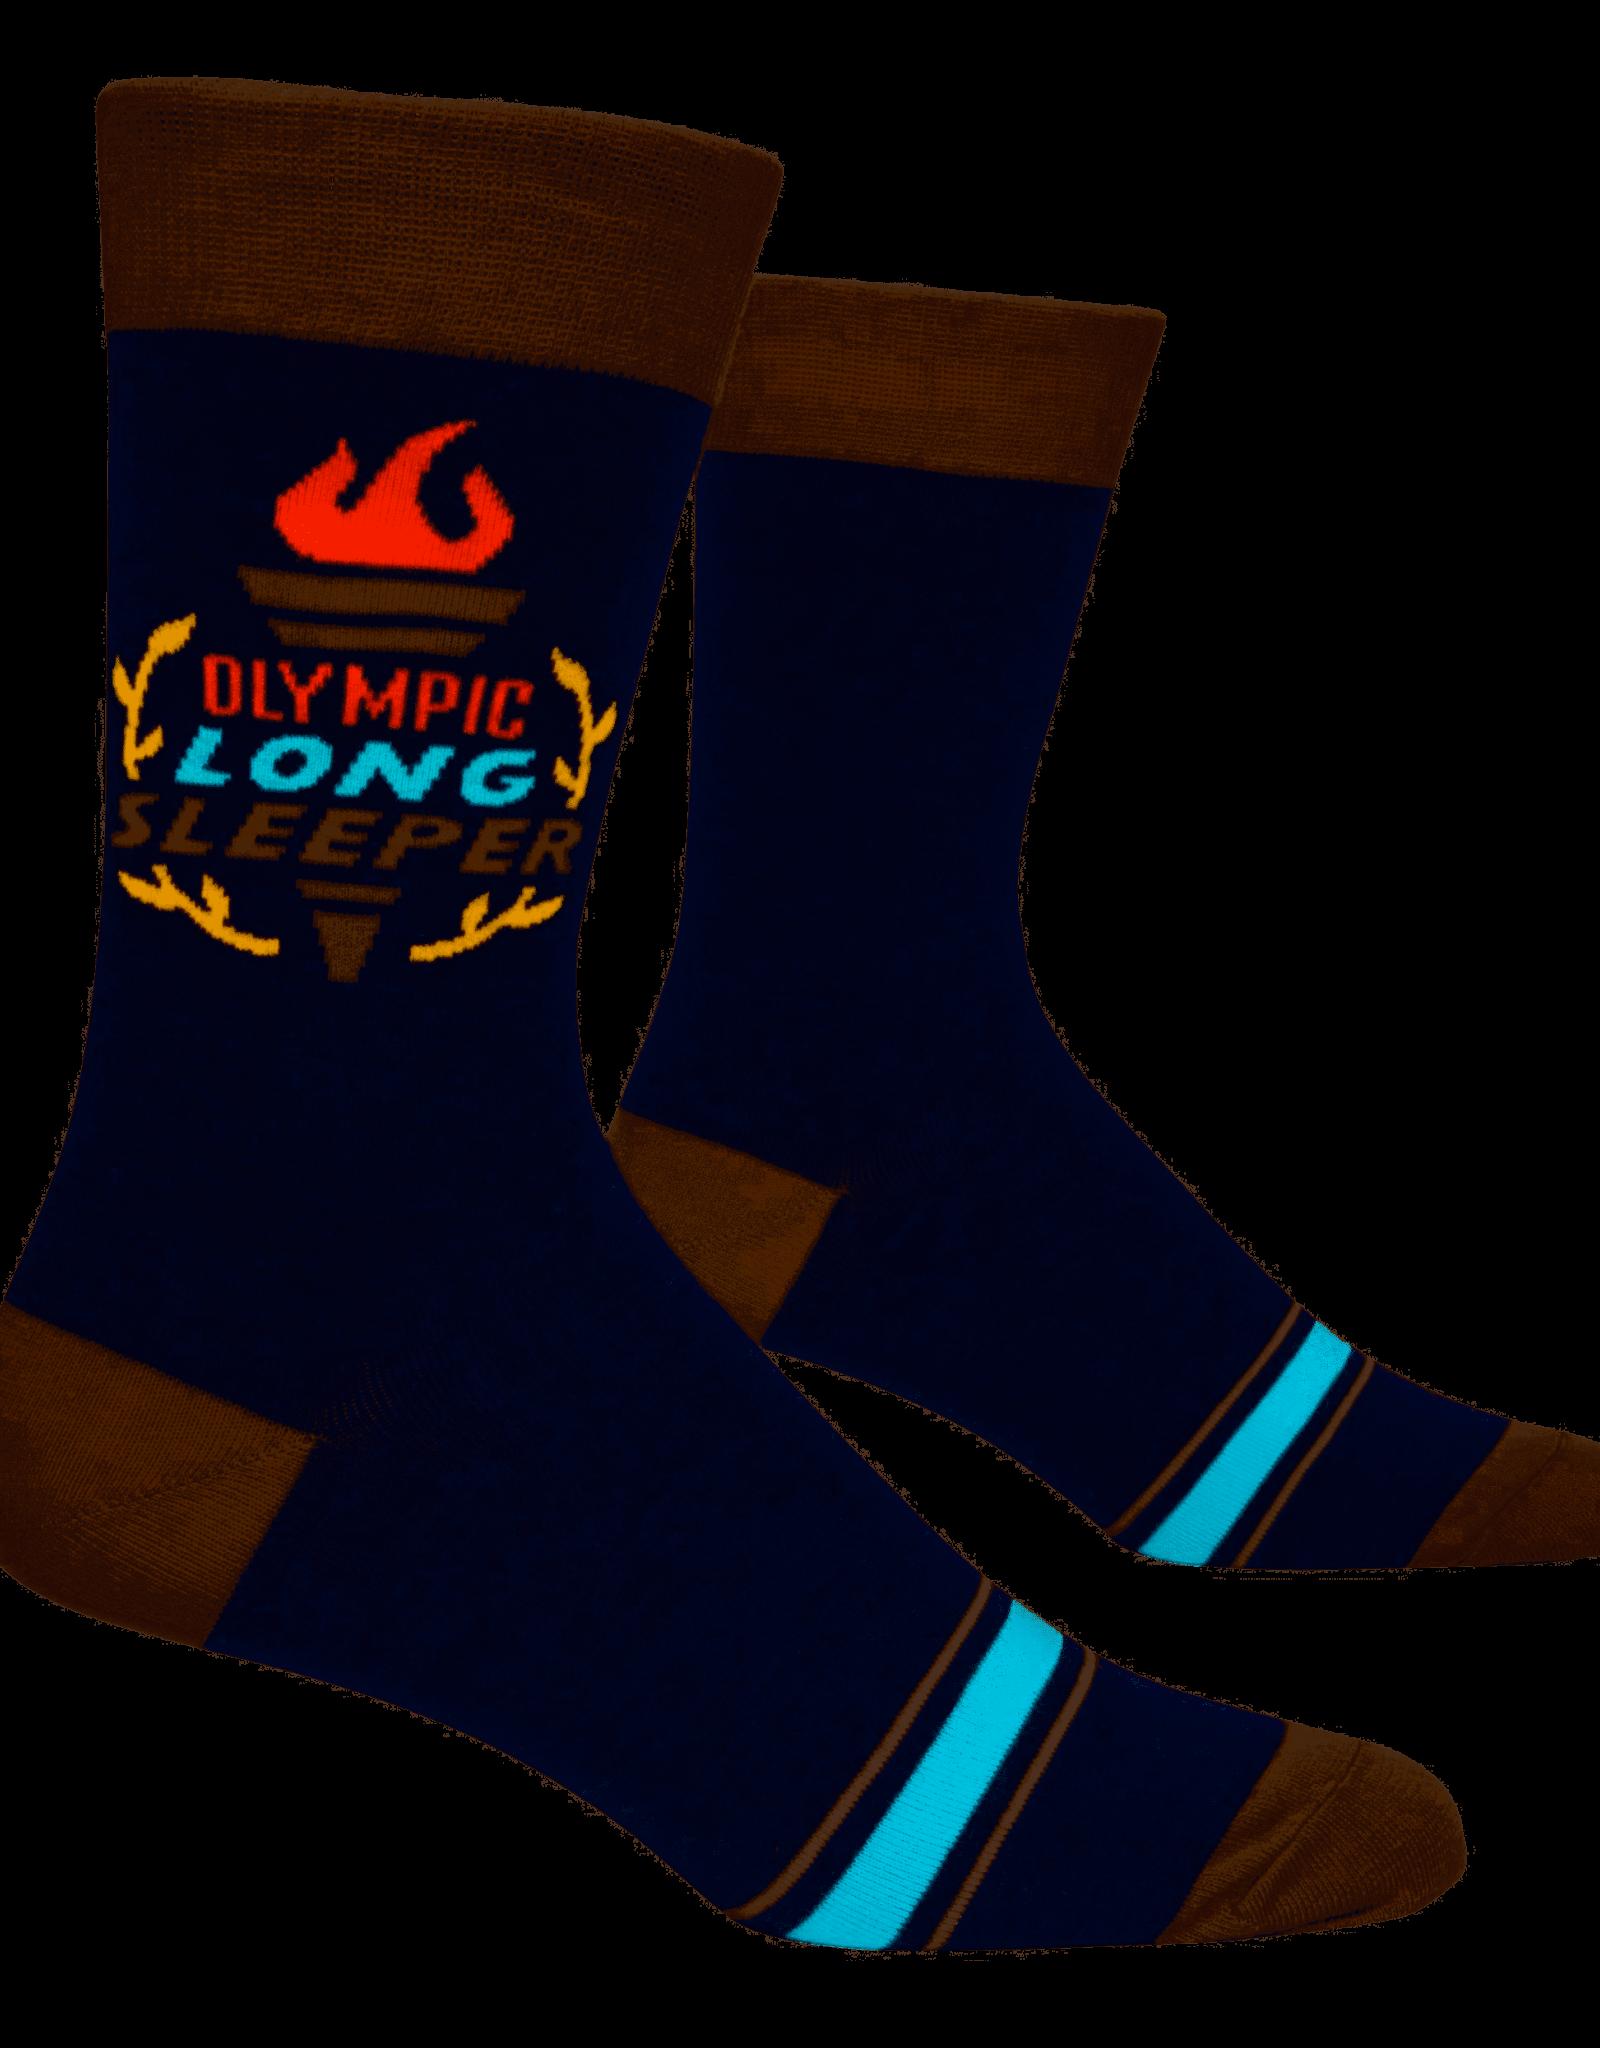 "Blue Q ""Olympic Long Sleeper"" Men's Crew Socks"